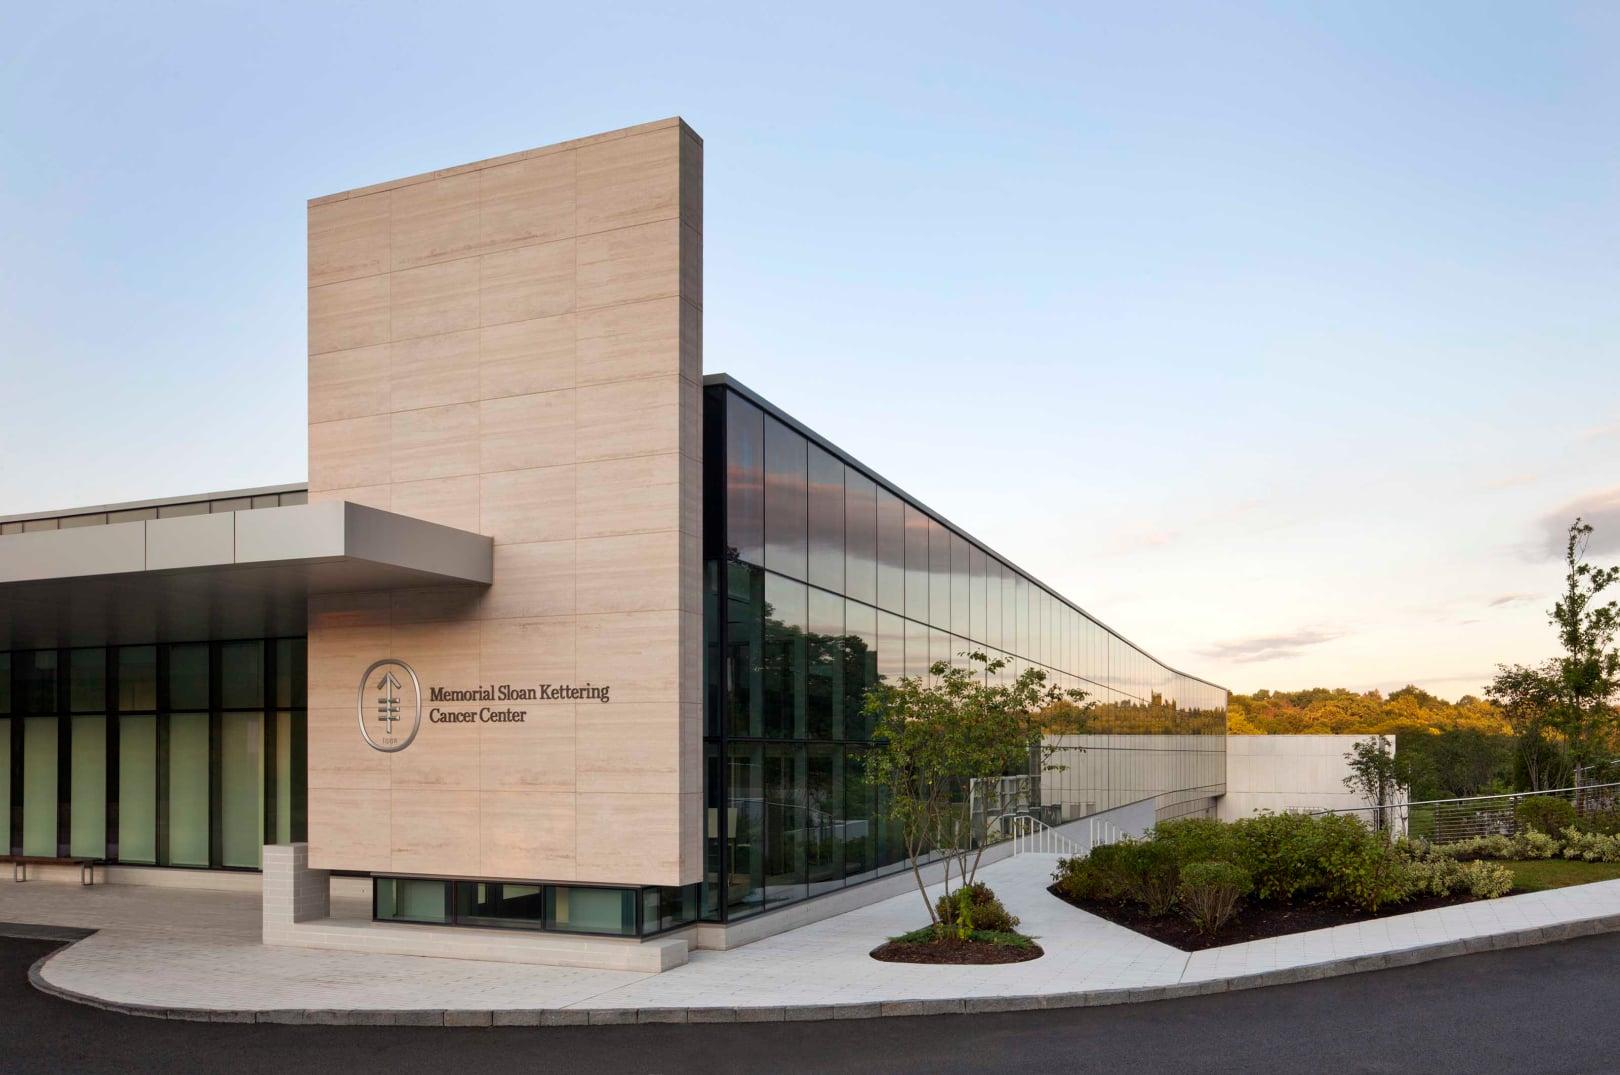 Memorial Sloan Kettering (MSK) Regional Ambulatory Cancer Center